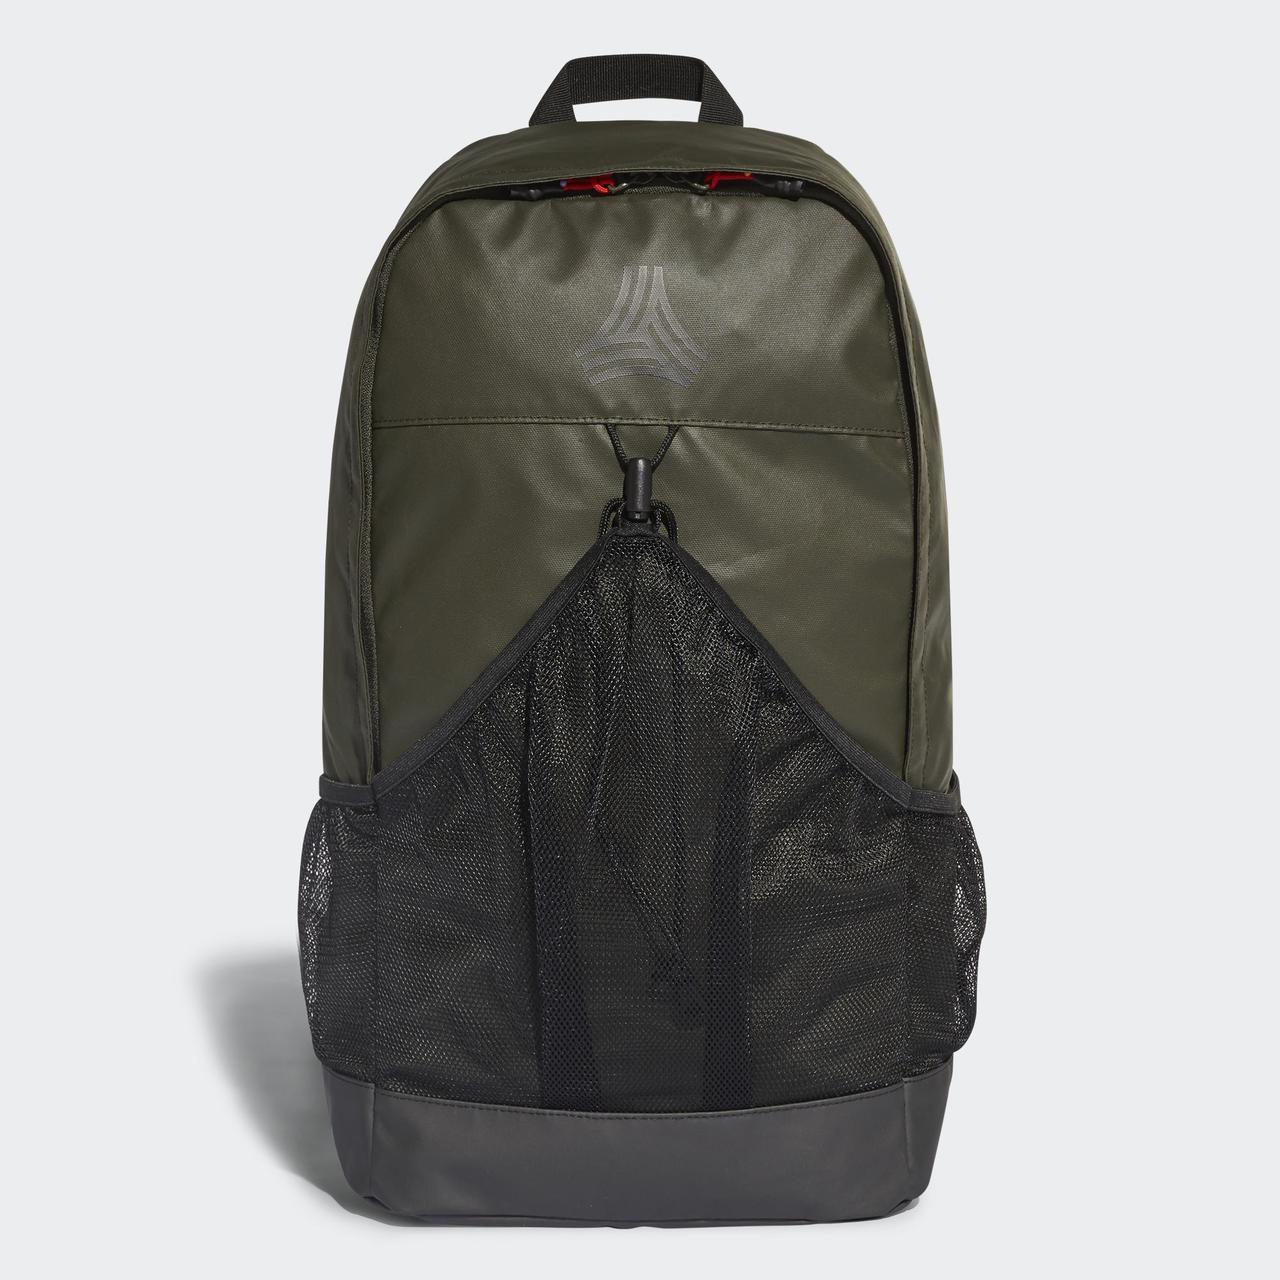 Рюкзак Adidas Football Street Backpack CY5629 (Оригинал) - Football Mall -  футбольный интернет- c4516f401b2